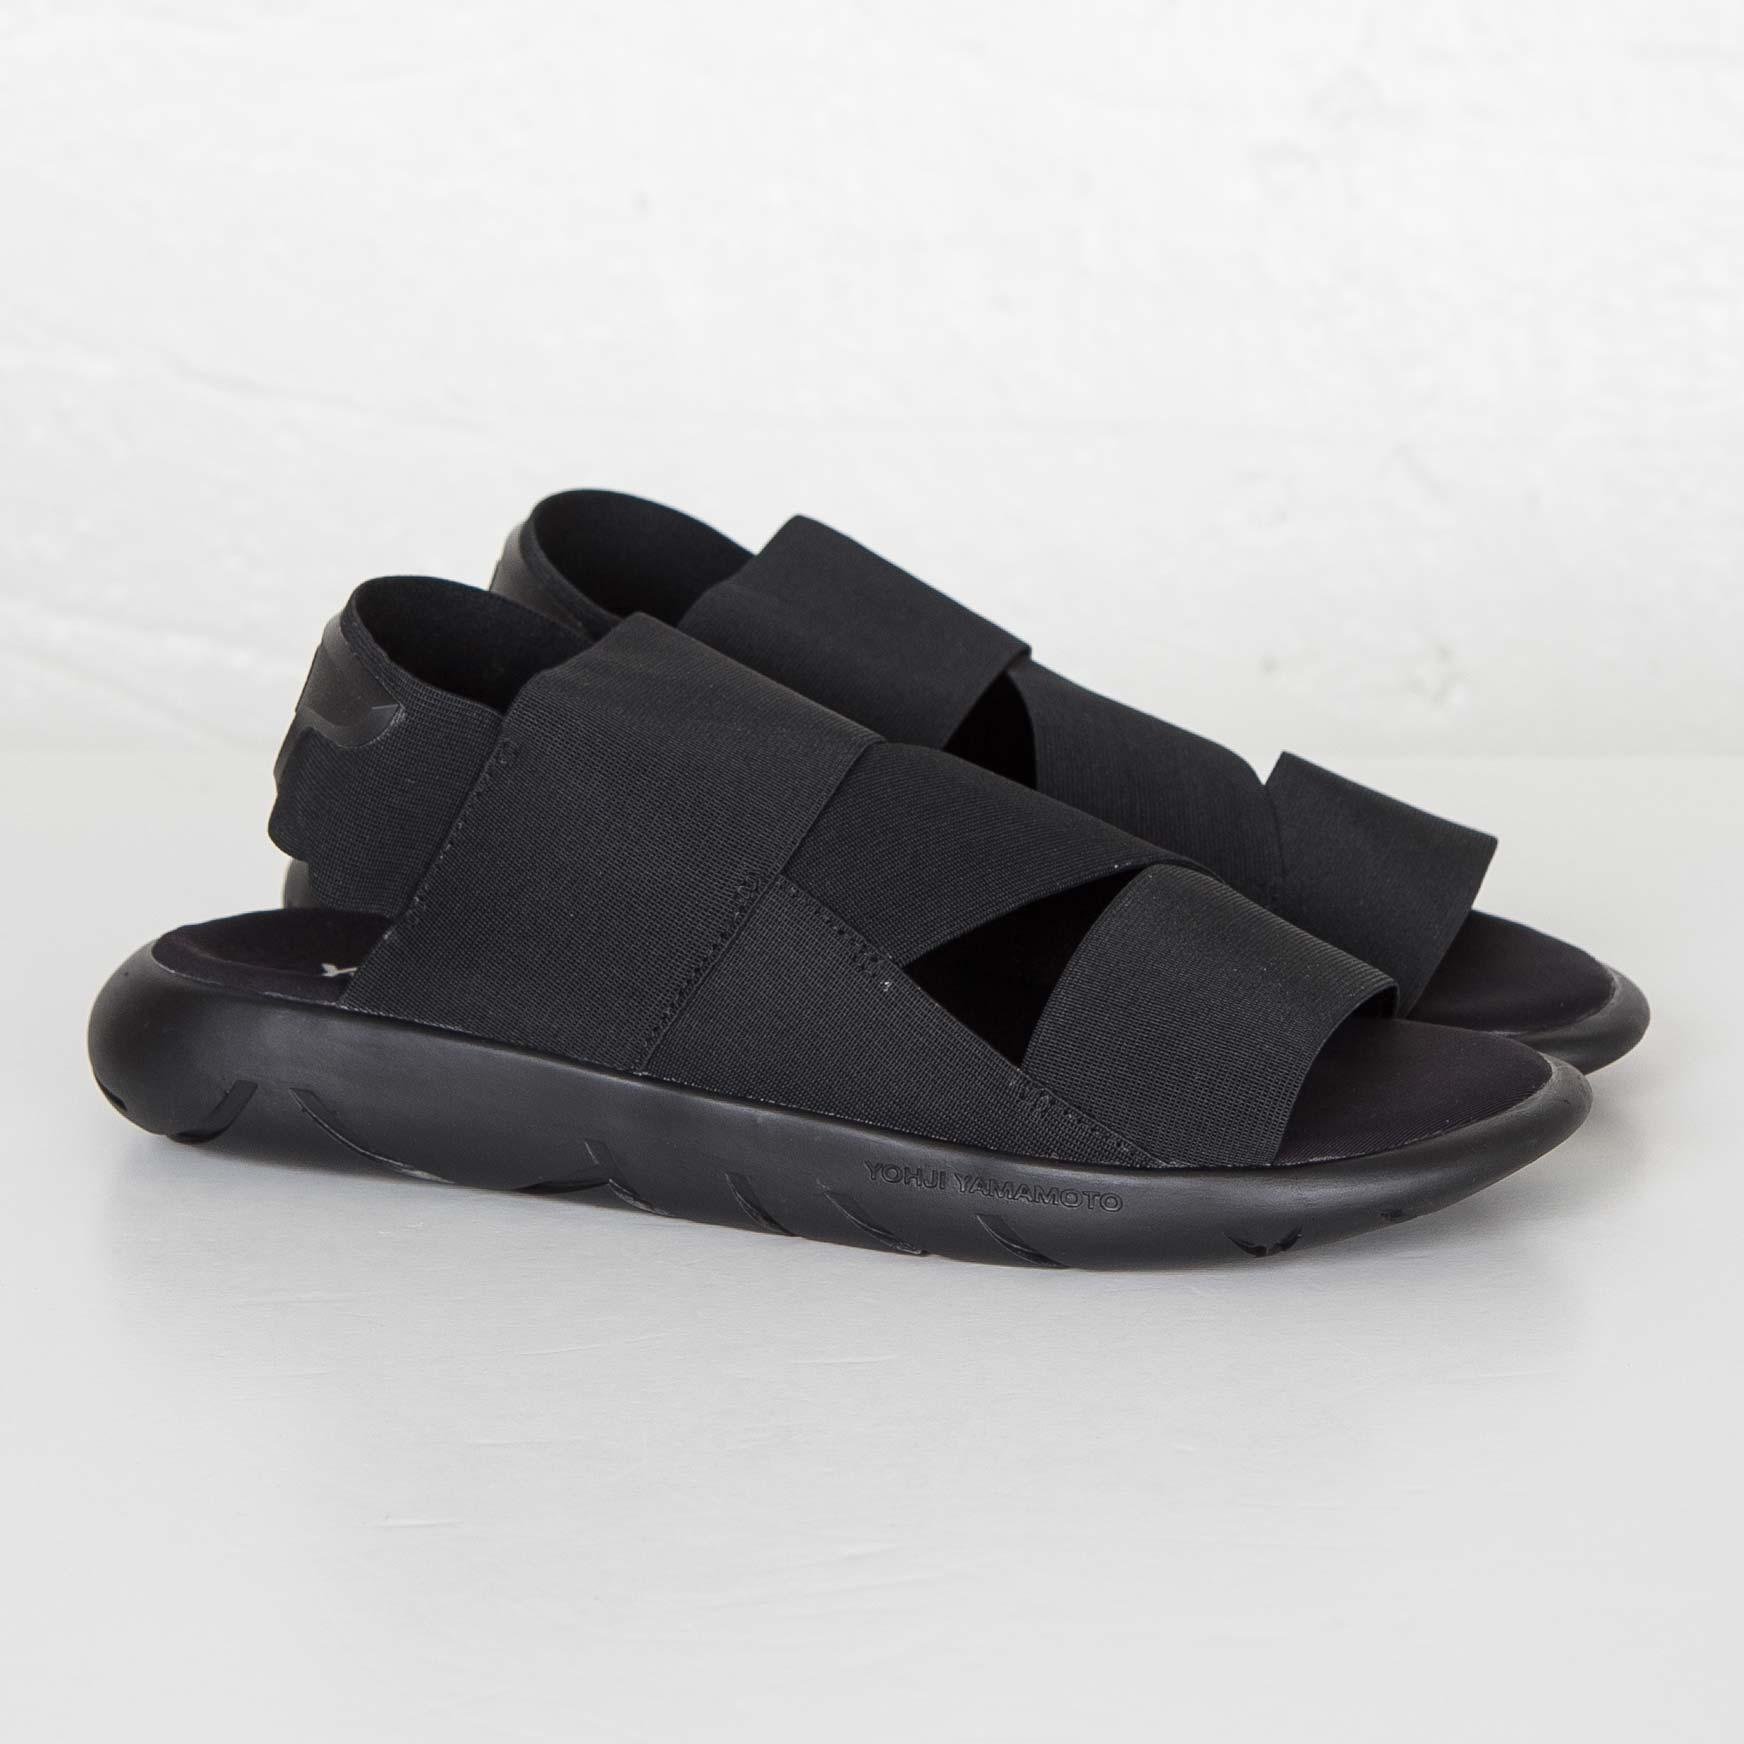 409f7352b adidas Y-3 Qasa Sandal - Aq5584 - Sneakersnstuff